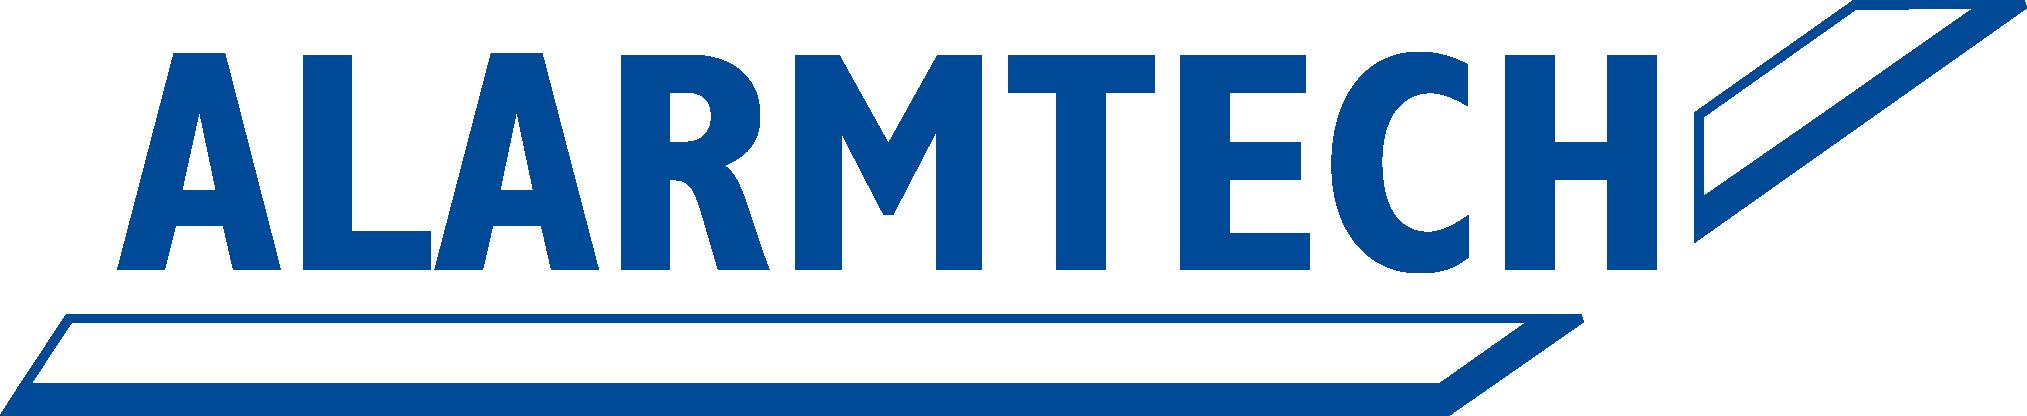 logo-alarmtech.png